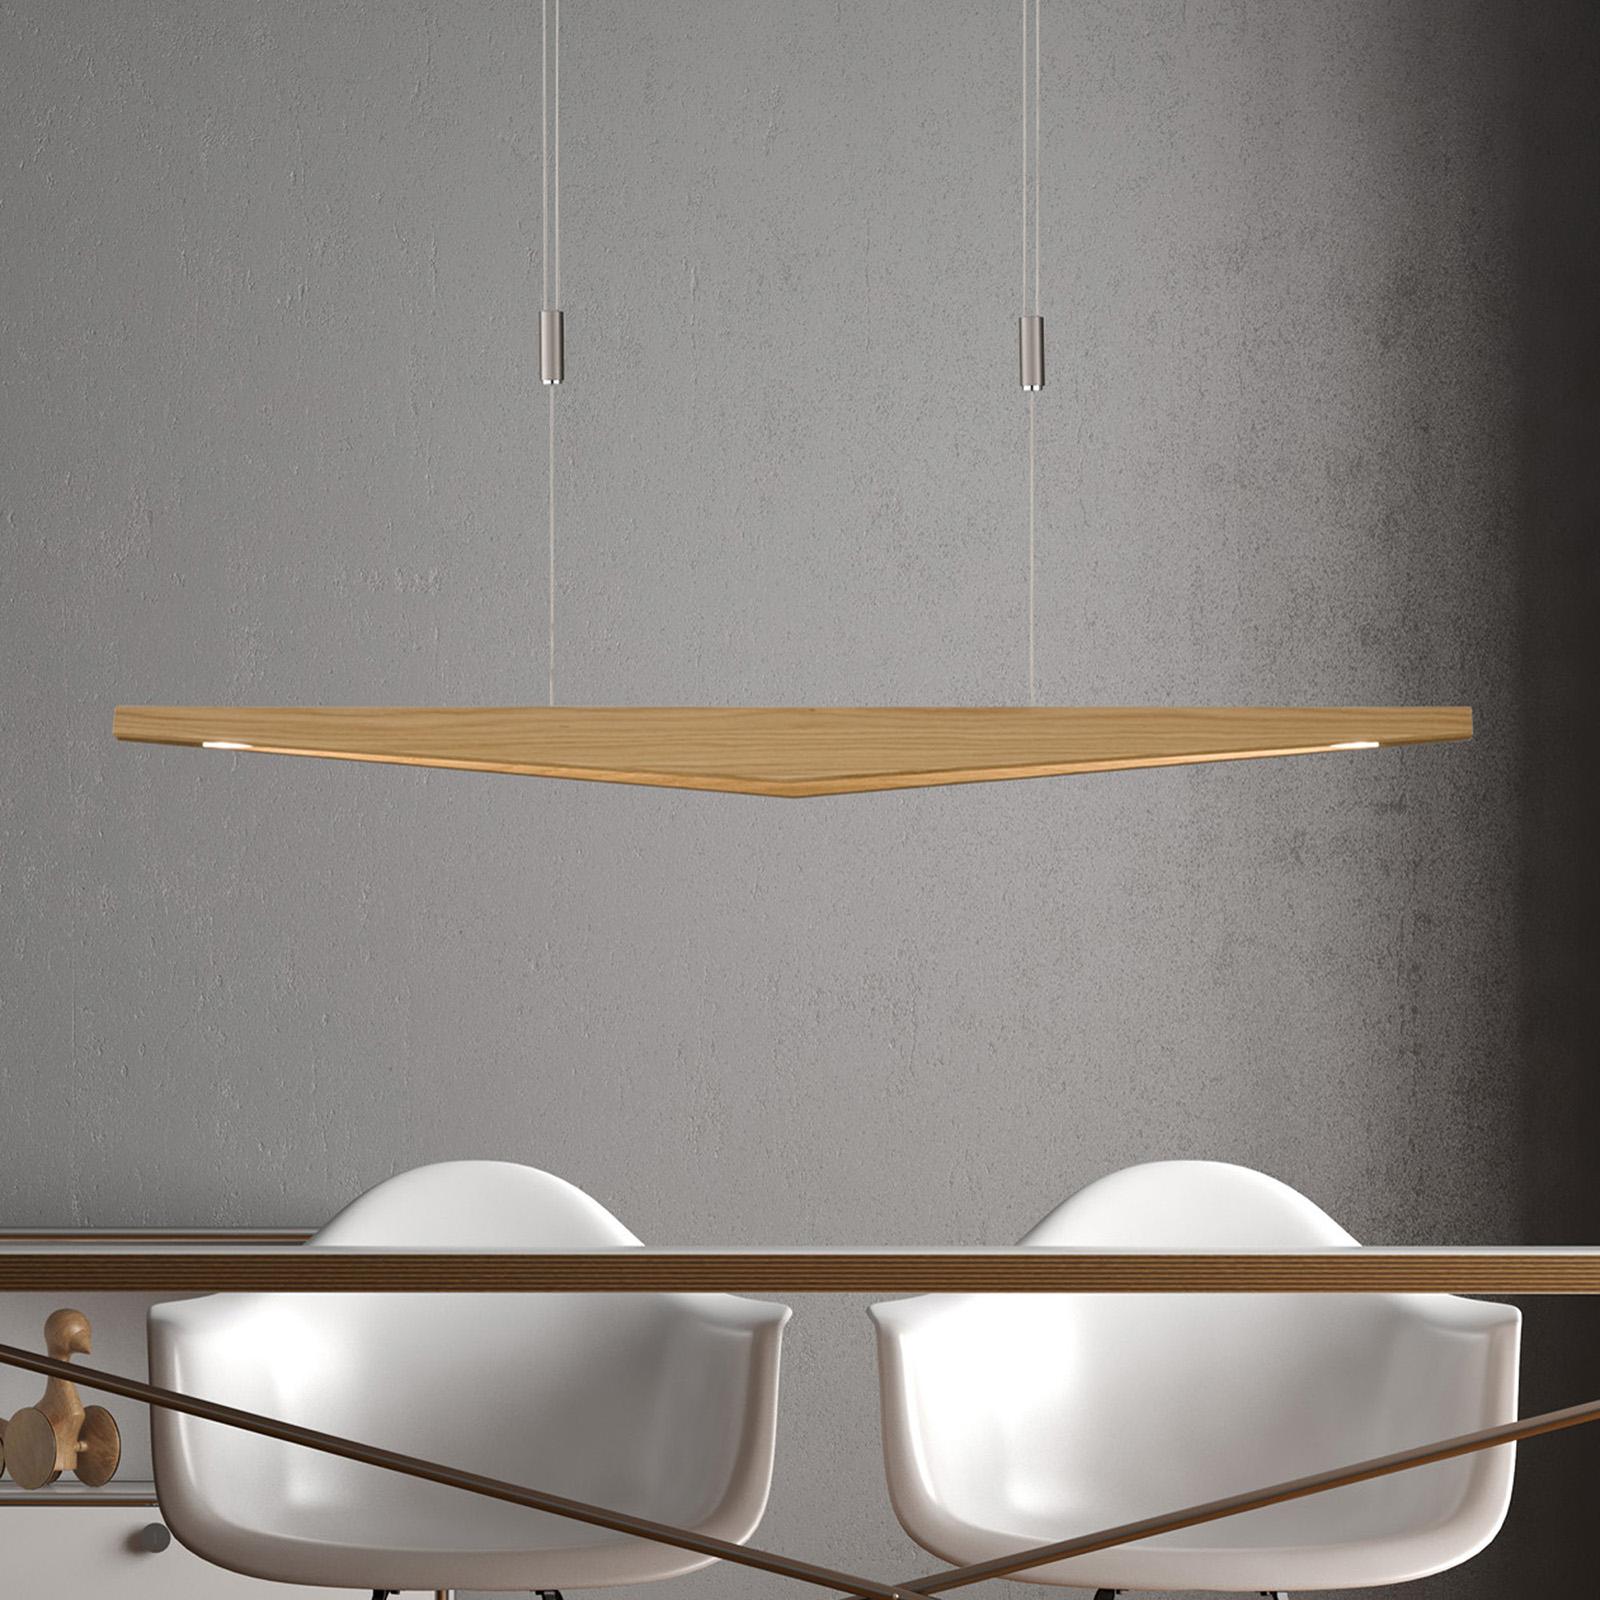 Lucande Dila LED-pendellampa ek natur 118 cm